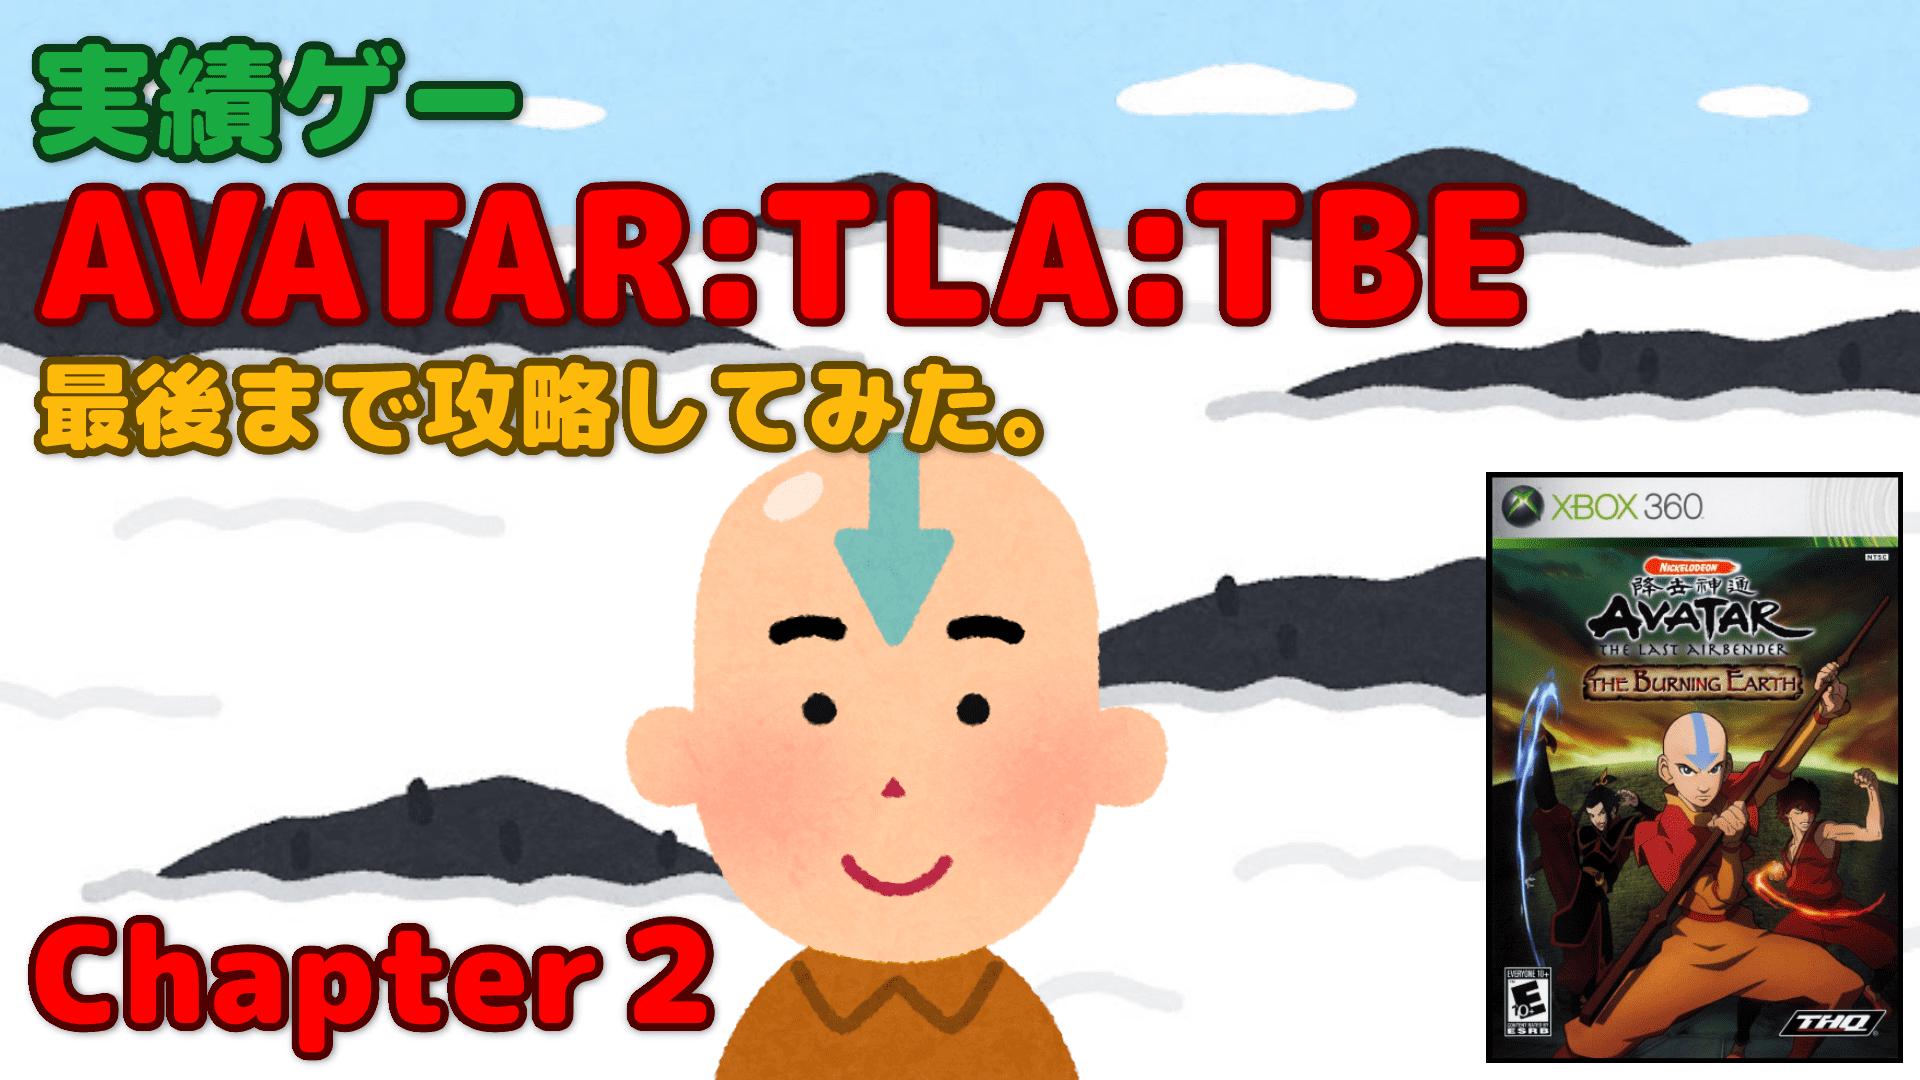 Avatar: TLA: TBE 最後まで攻略 Chapter2